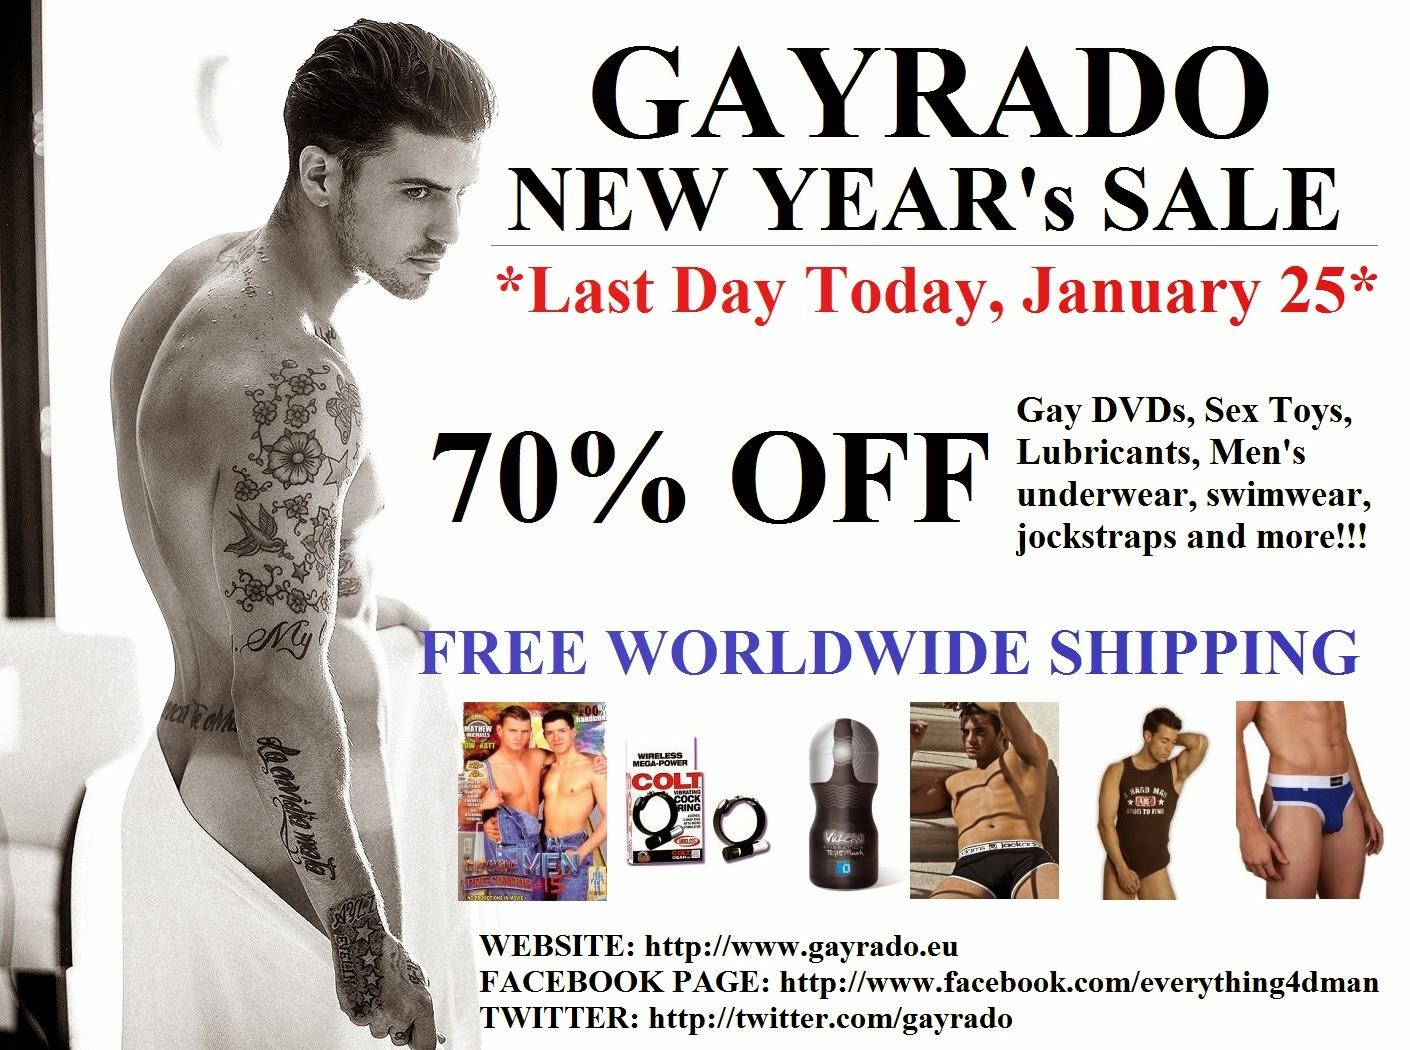 Gayrado Online Shop New Years Sale Last Day